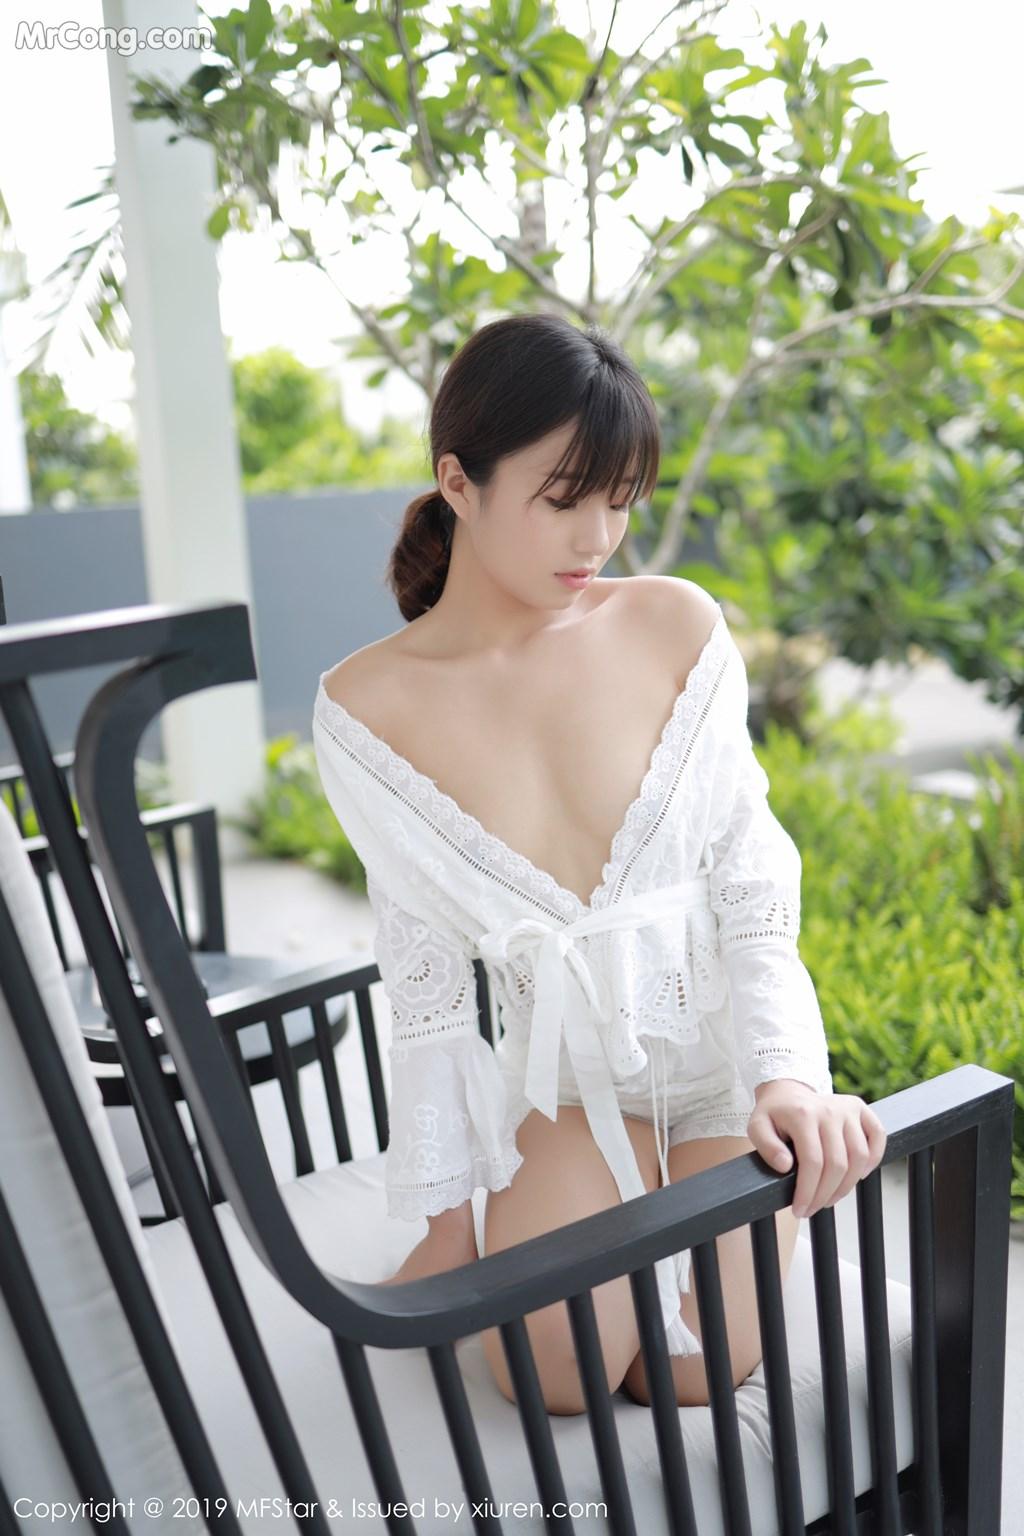 Image MFStar-Vol.192-Cang-Jing-You-Xiang-MrCong.com-006 in post MFStar Vol.192: Cang Jing You Xiang (仓井优香) (41 ảnh)